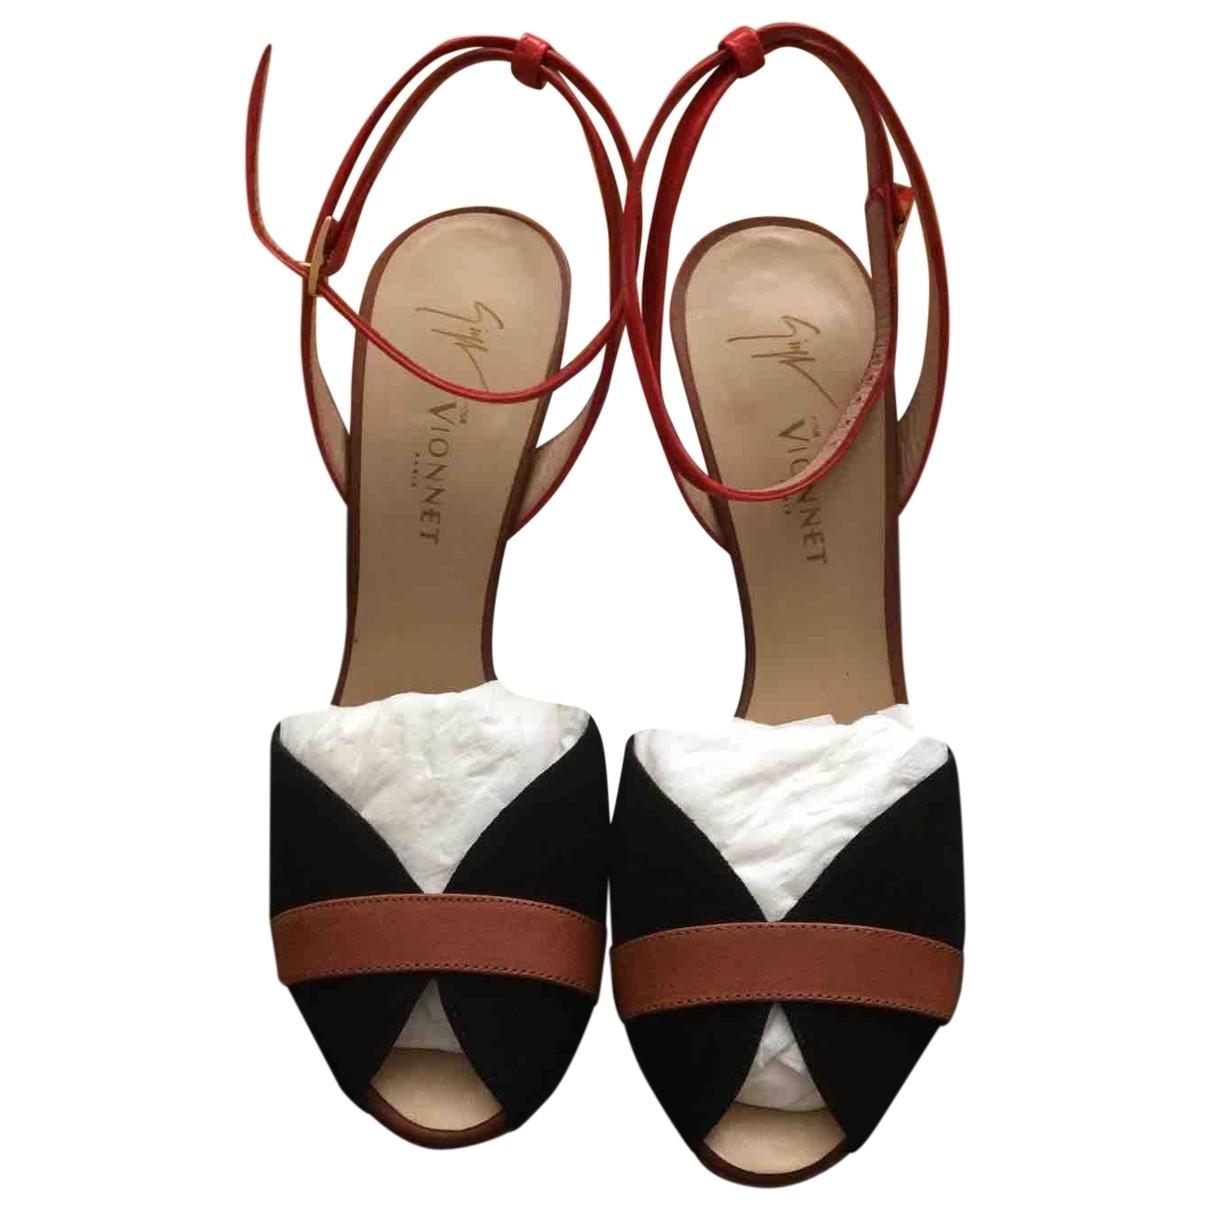 Sandalias de Cuero Vionnet